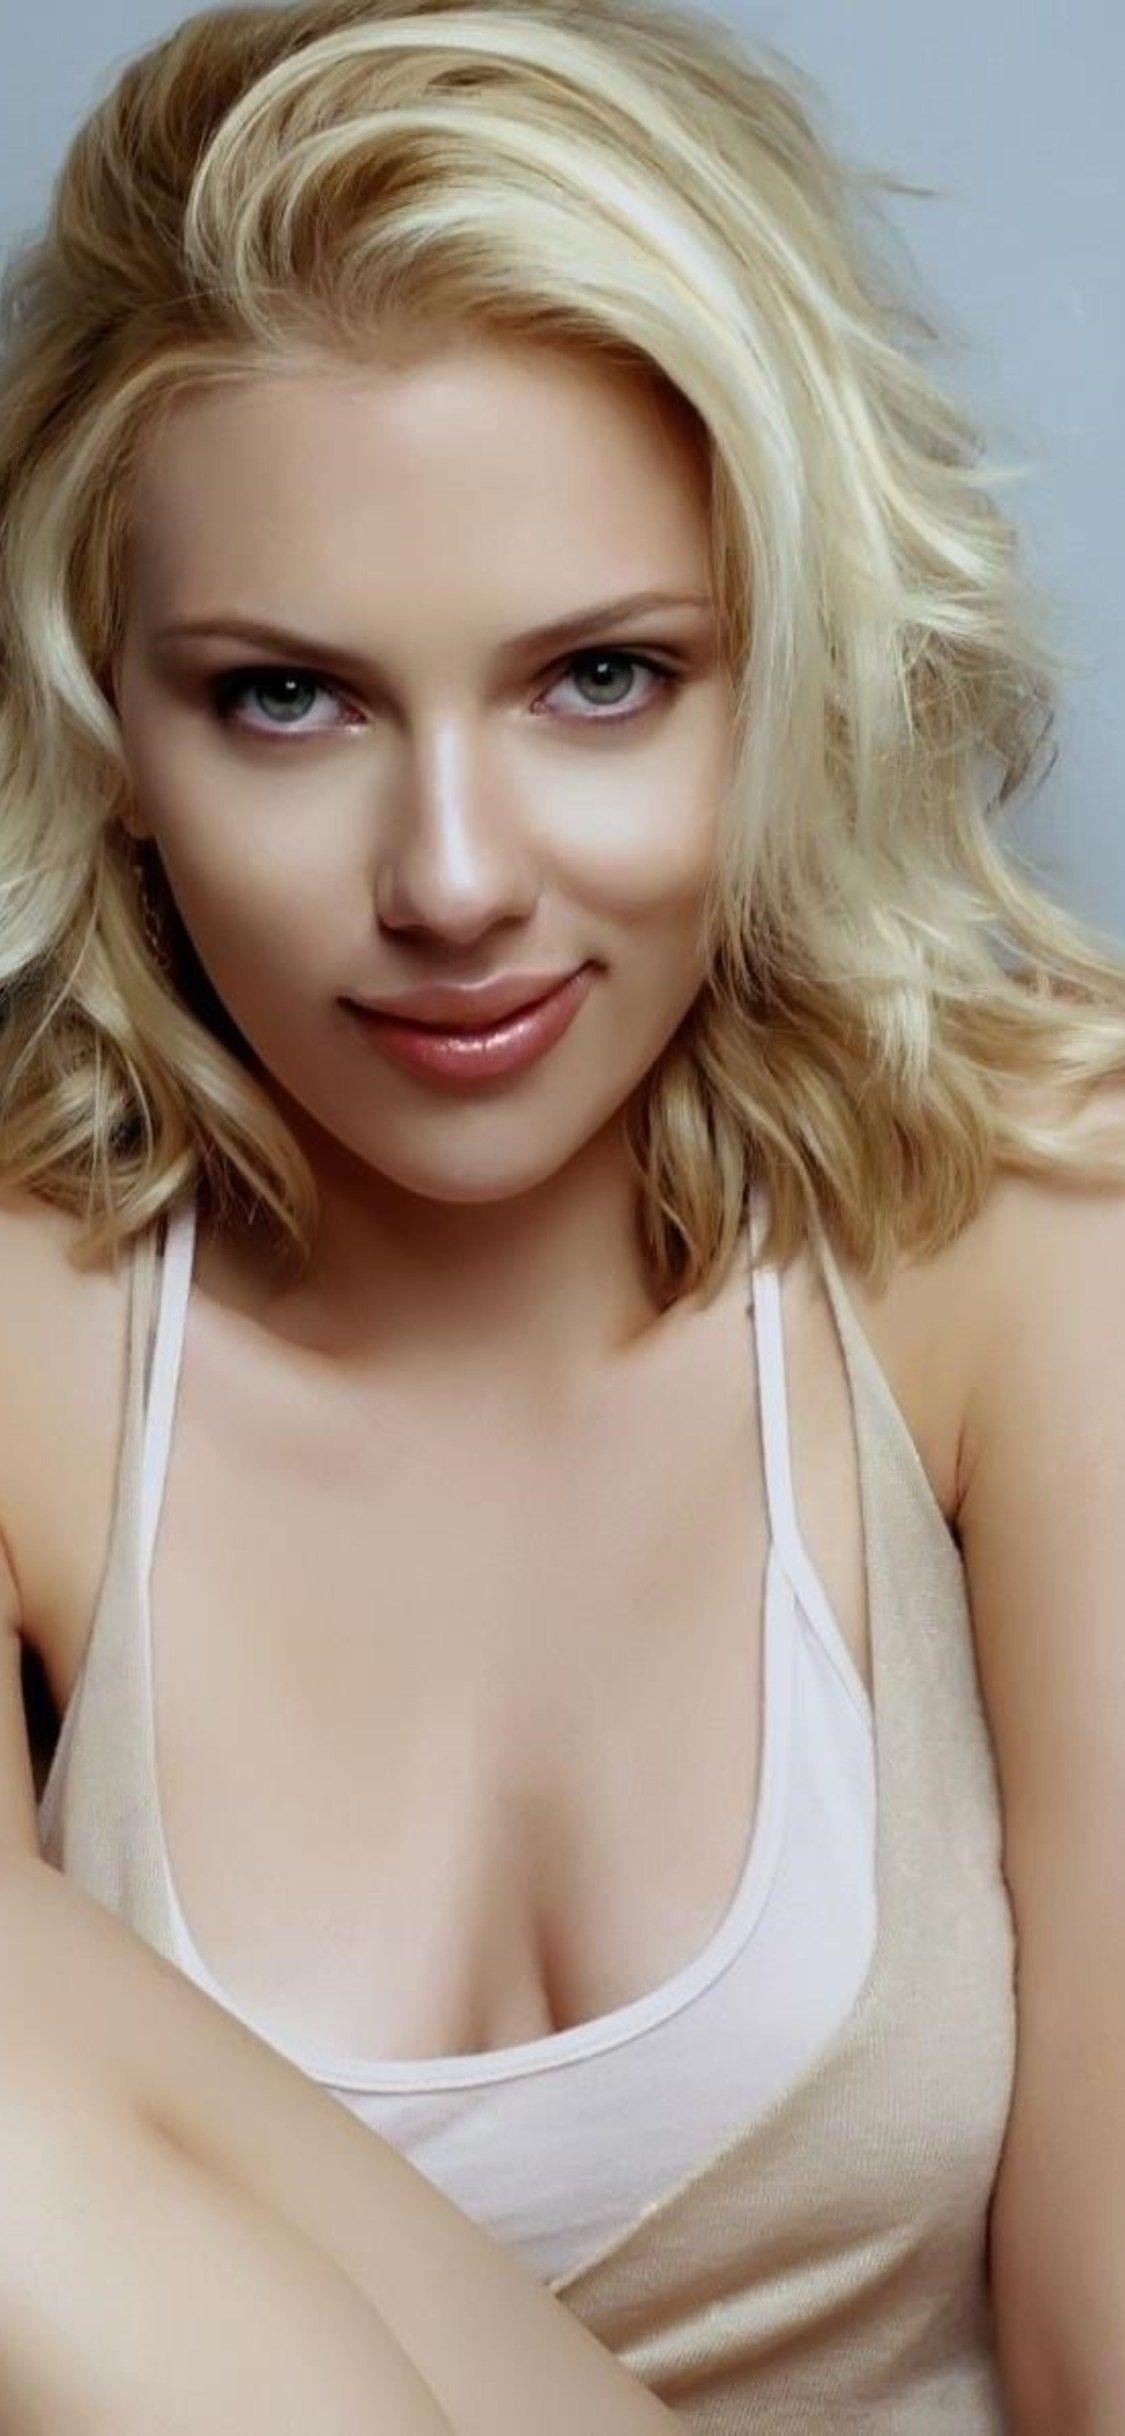 1125x2436 Scarlett Johansson 1 Iphone Xs Iphone 10 Iphone X Hd 4k